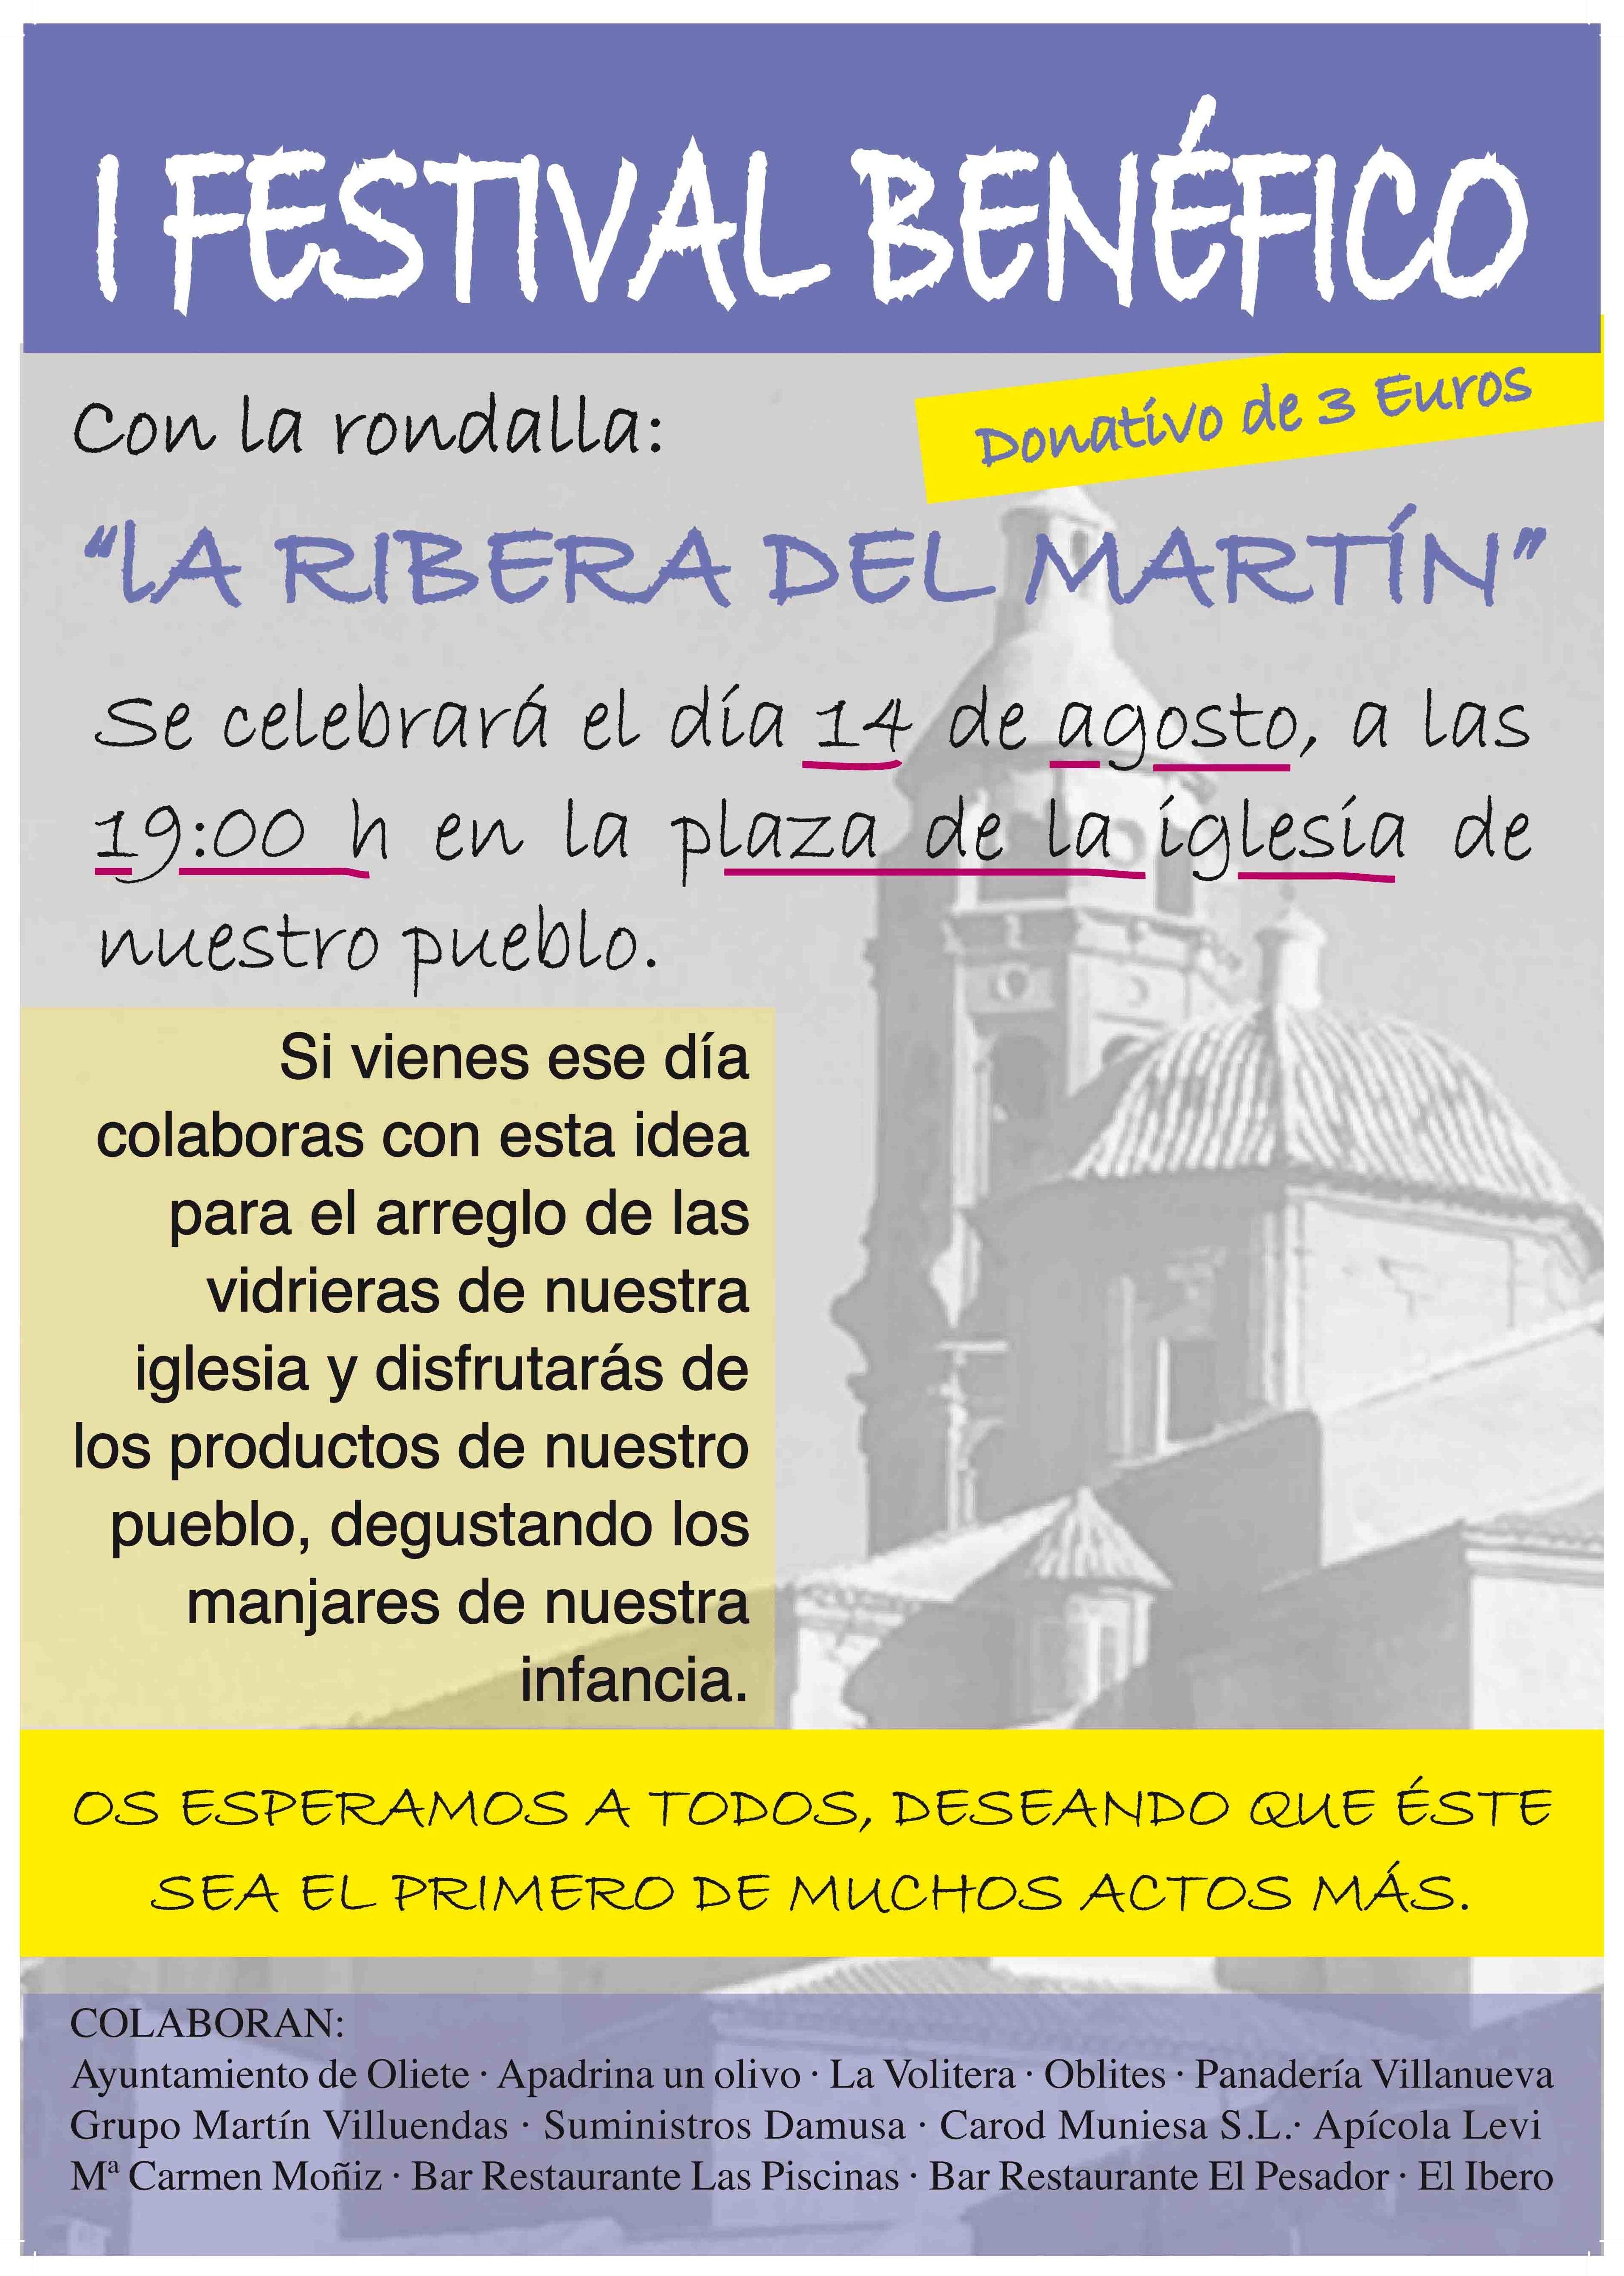 Impresión digital de carteles en Zaragoza